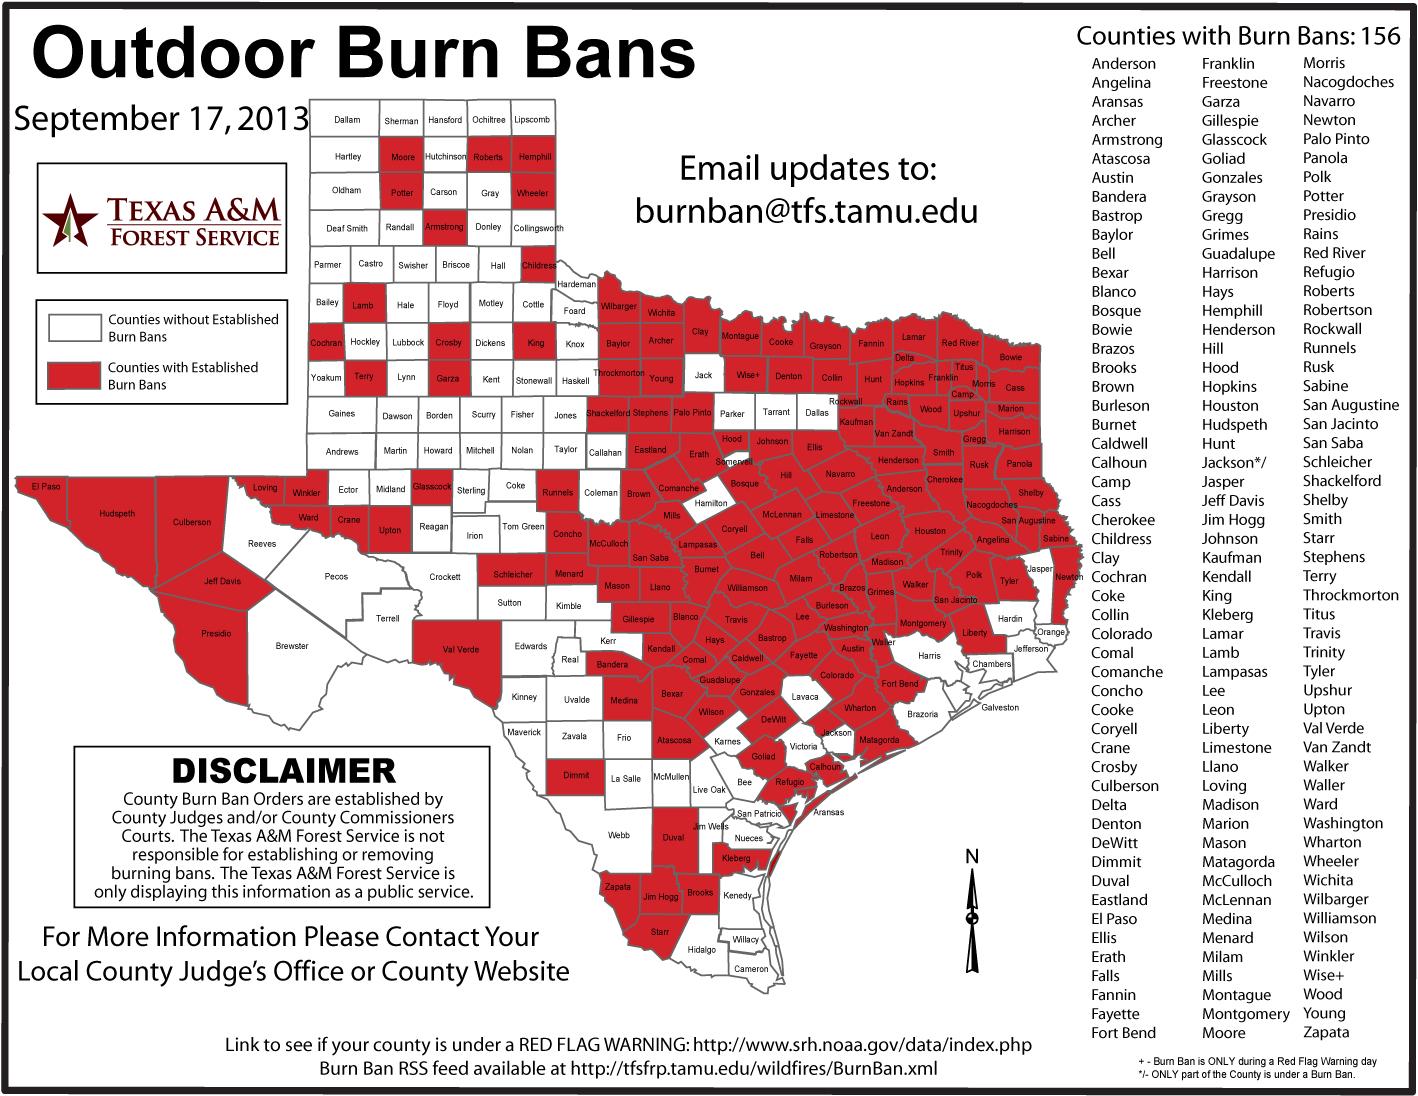 Texas County Burn Ban Map | Business Ideas 2013 - Texas Burn Ban Map